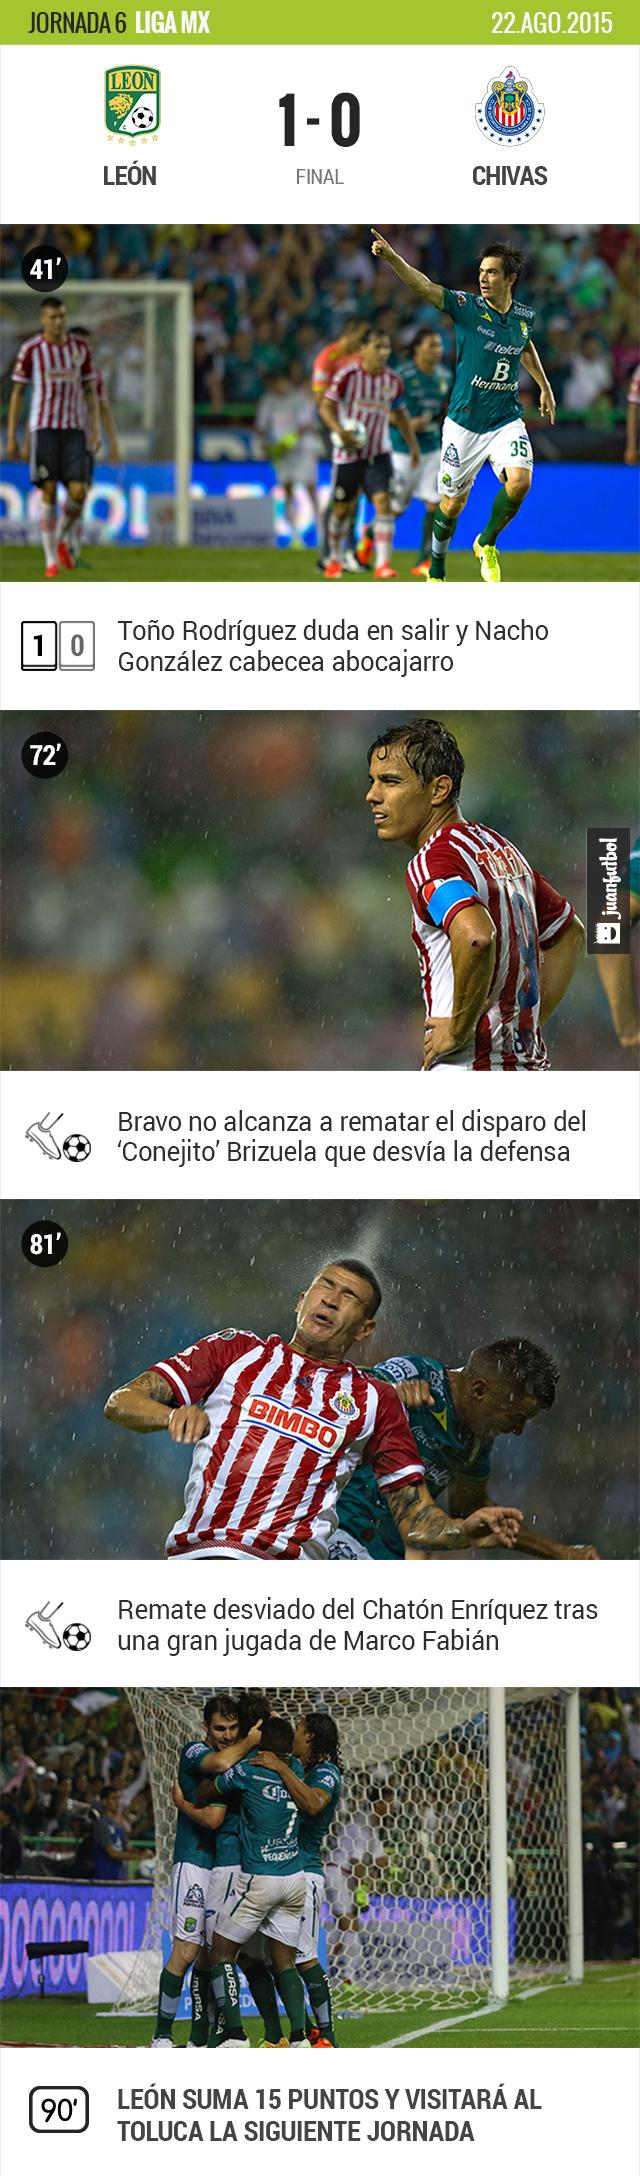 León 1-0 Chivas